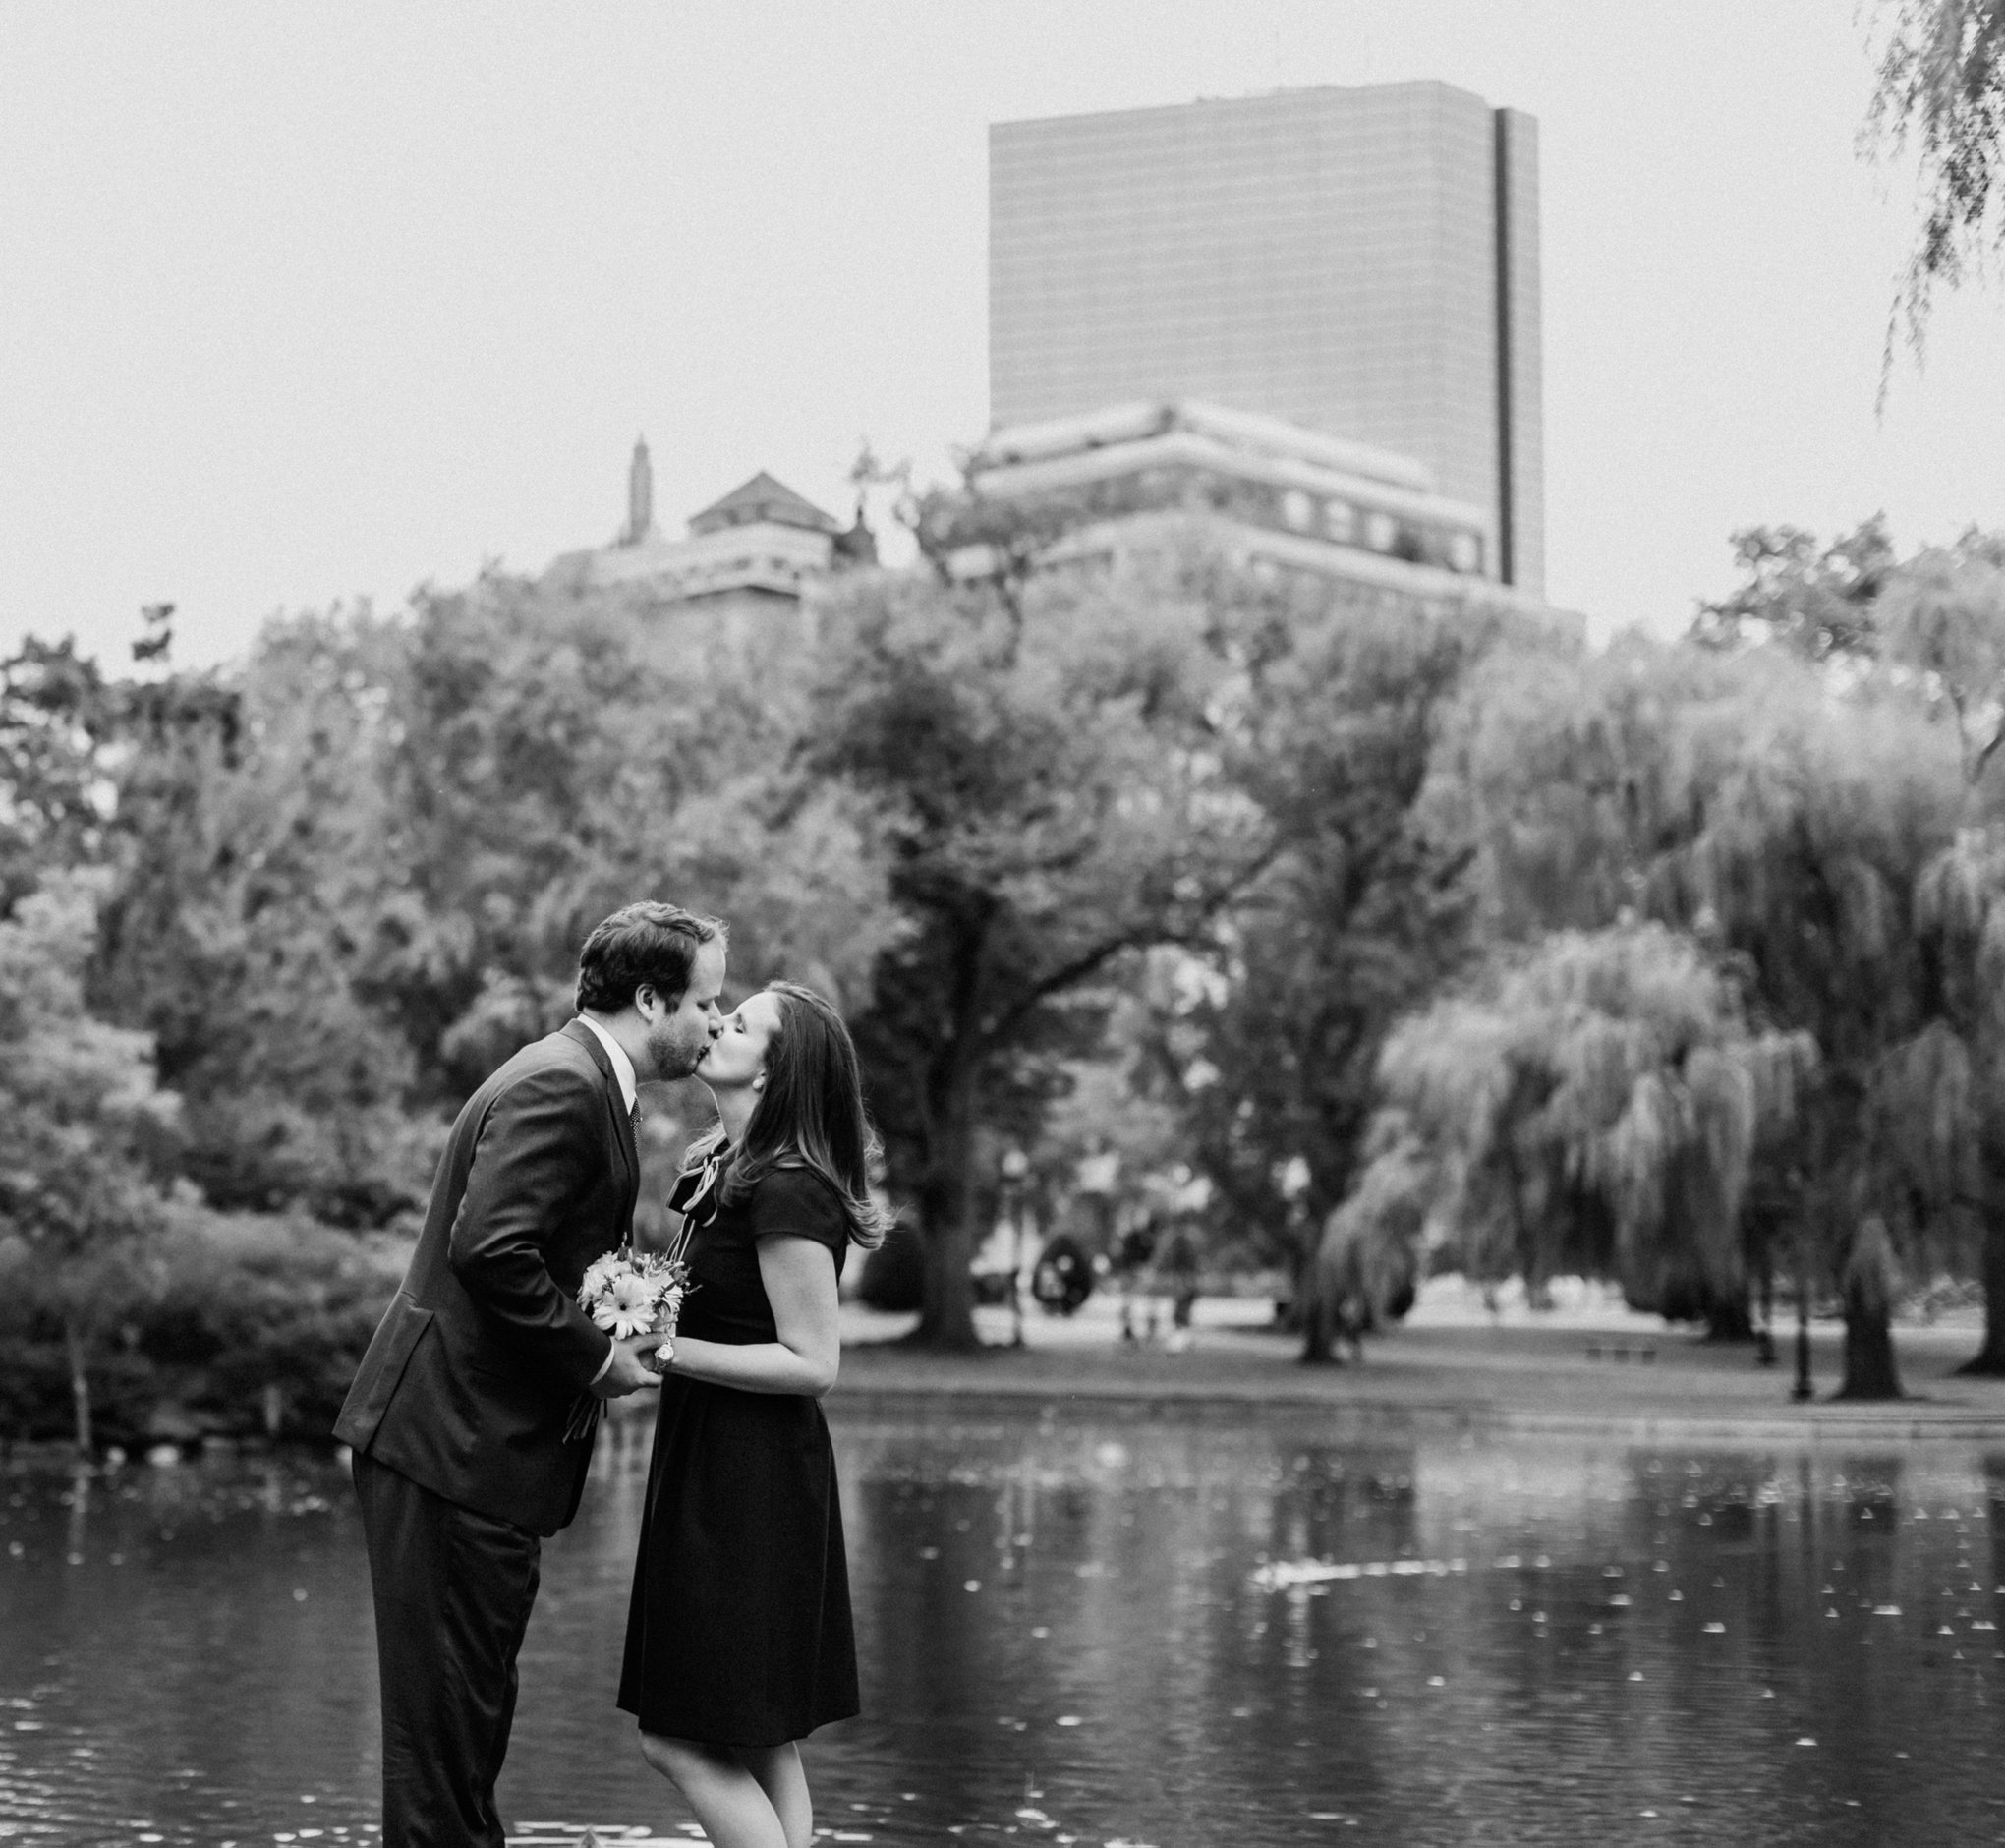 Lena_Mirisola_2017_Weddings_-020.jpg